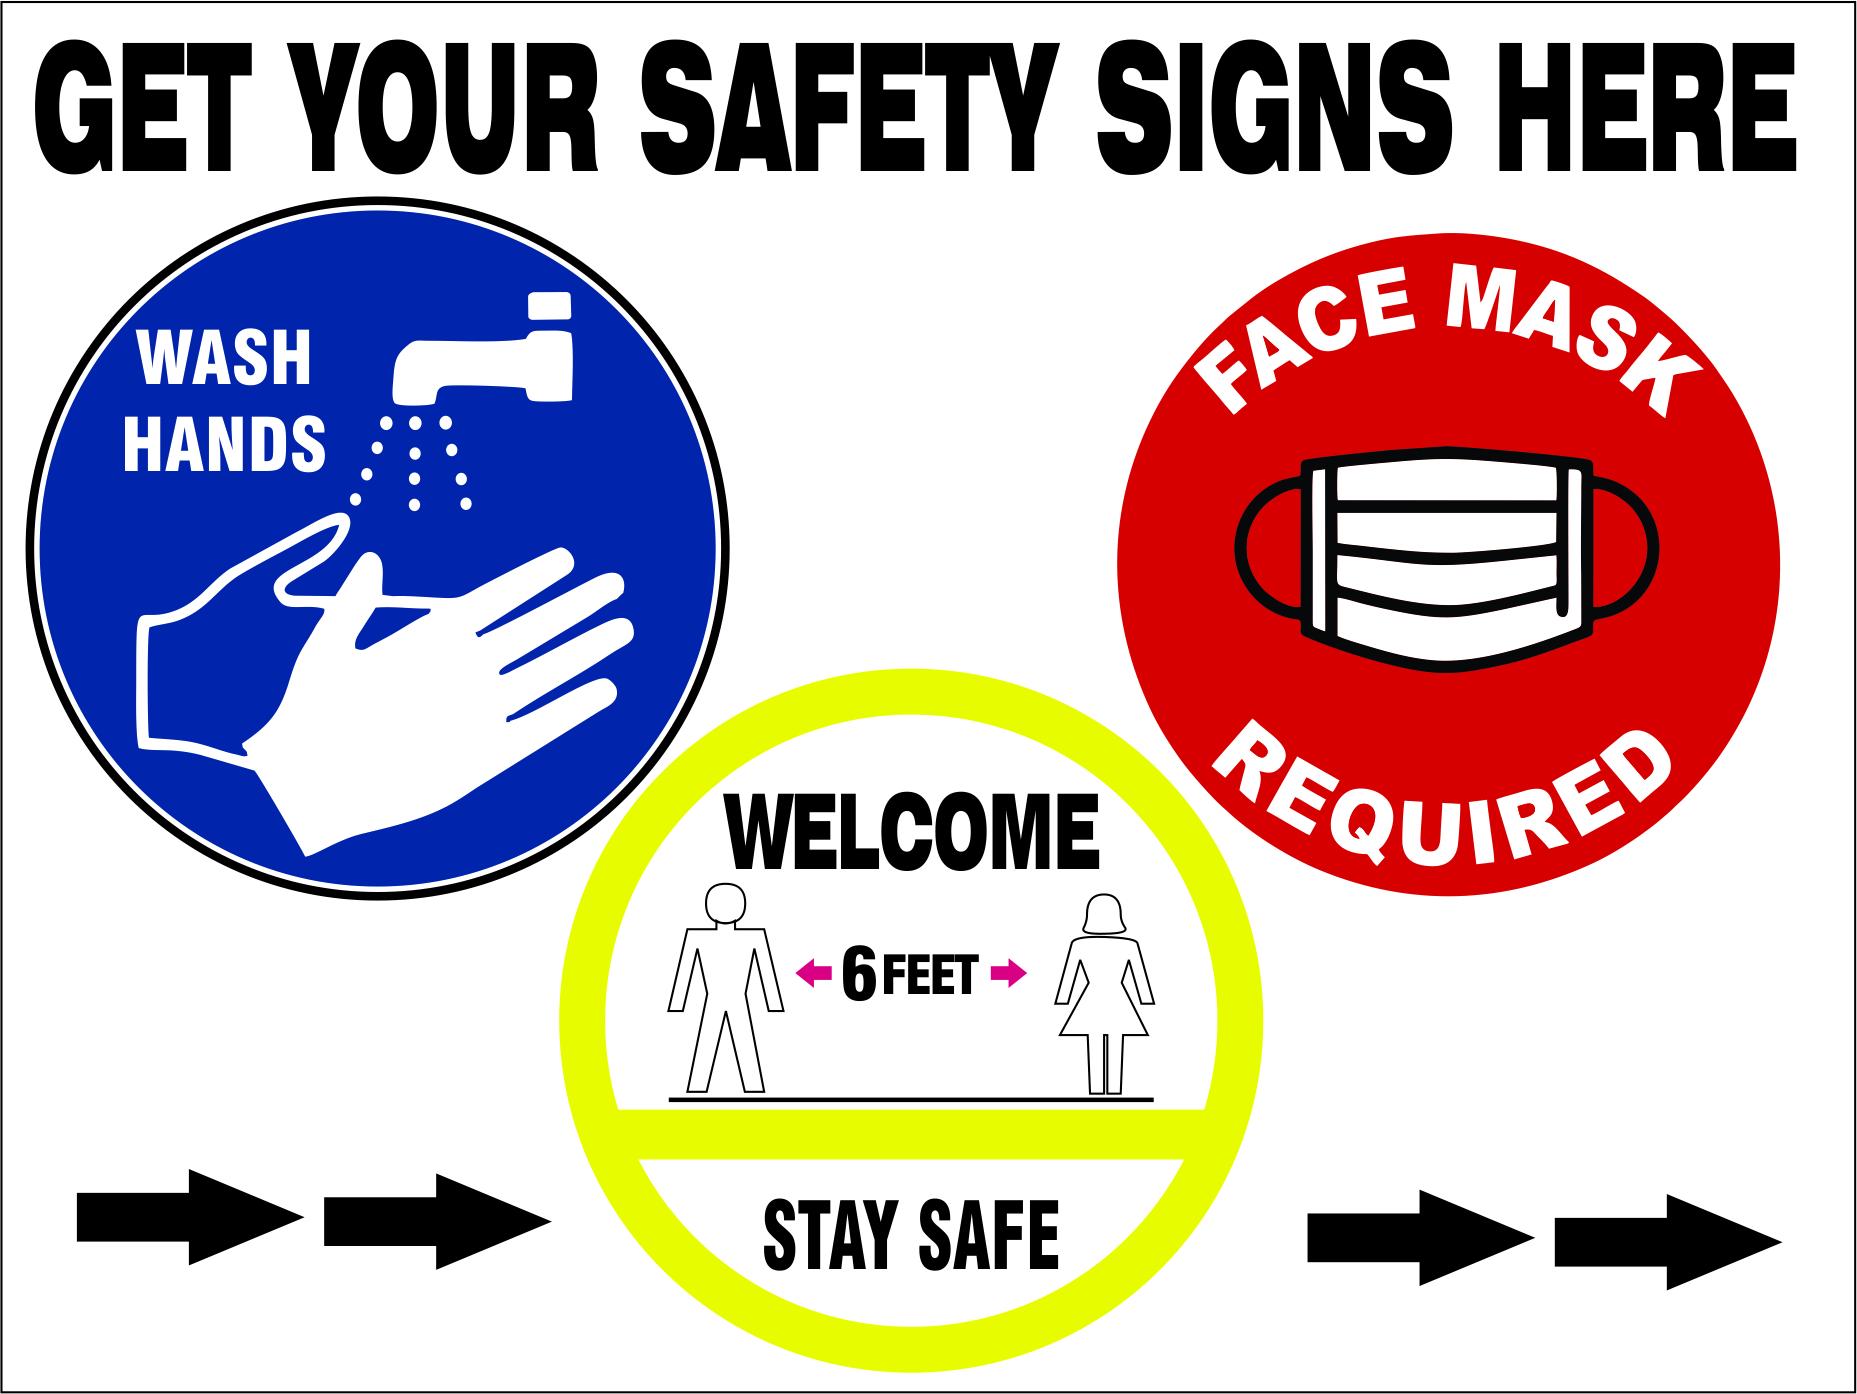 https://0201.nccdn.net/1_2/000/000/11f/502/covid-safety-signs.jpg